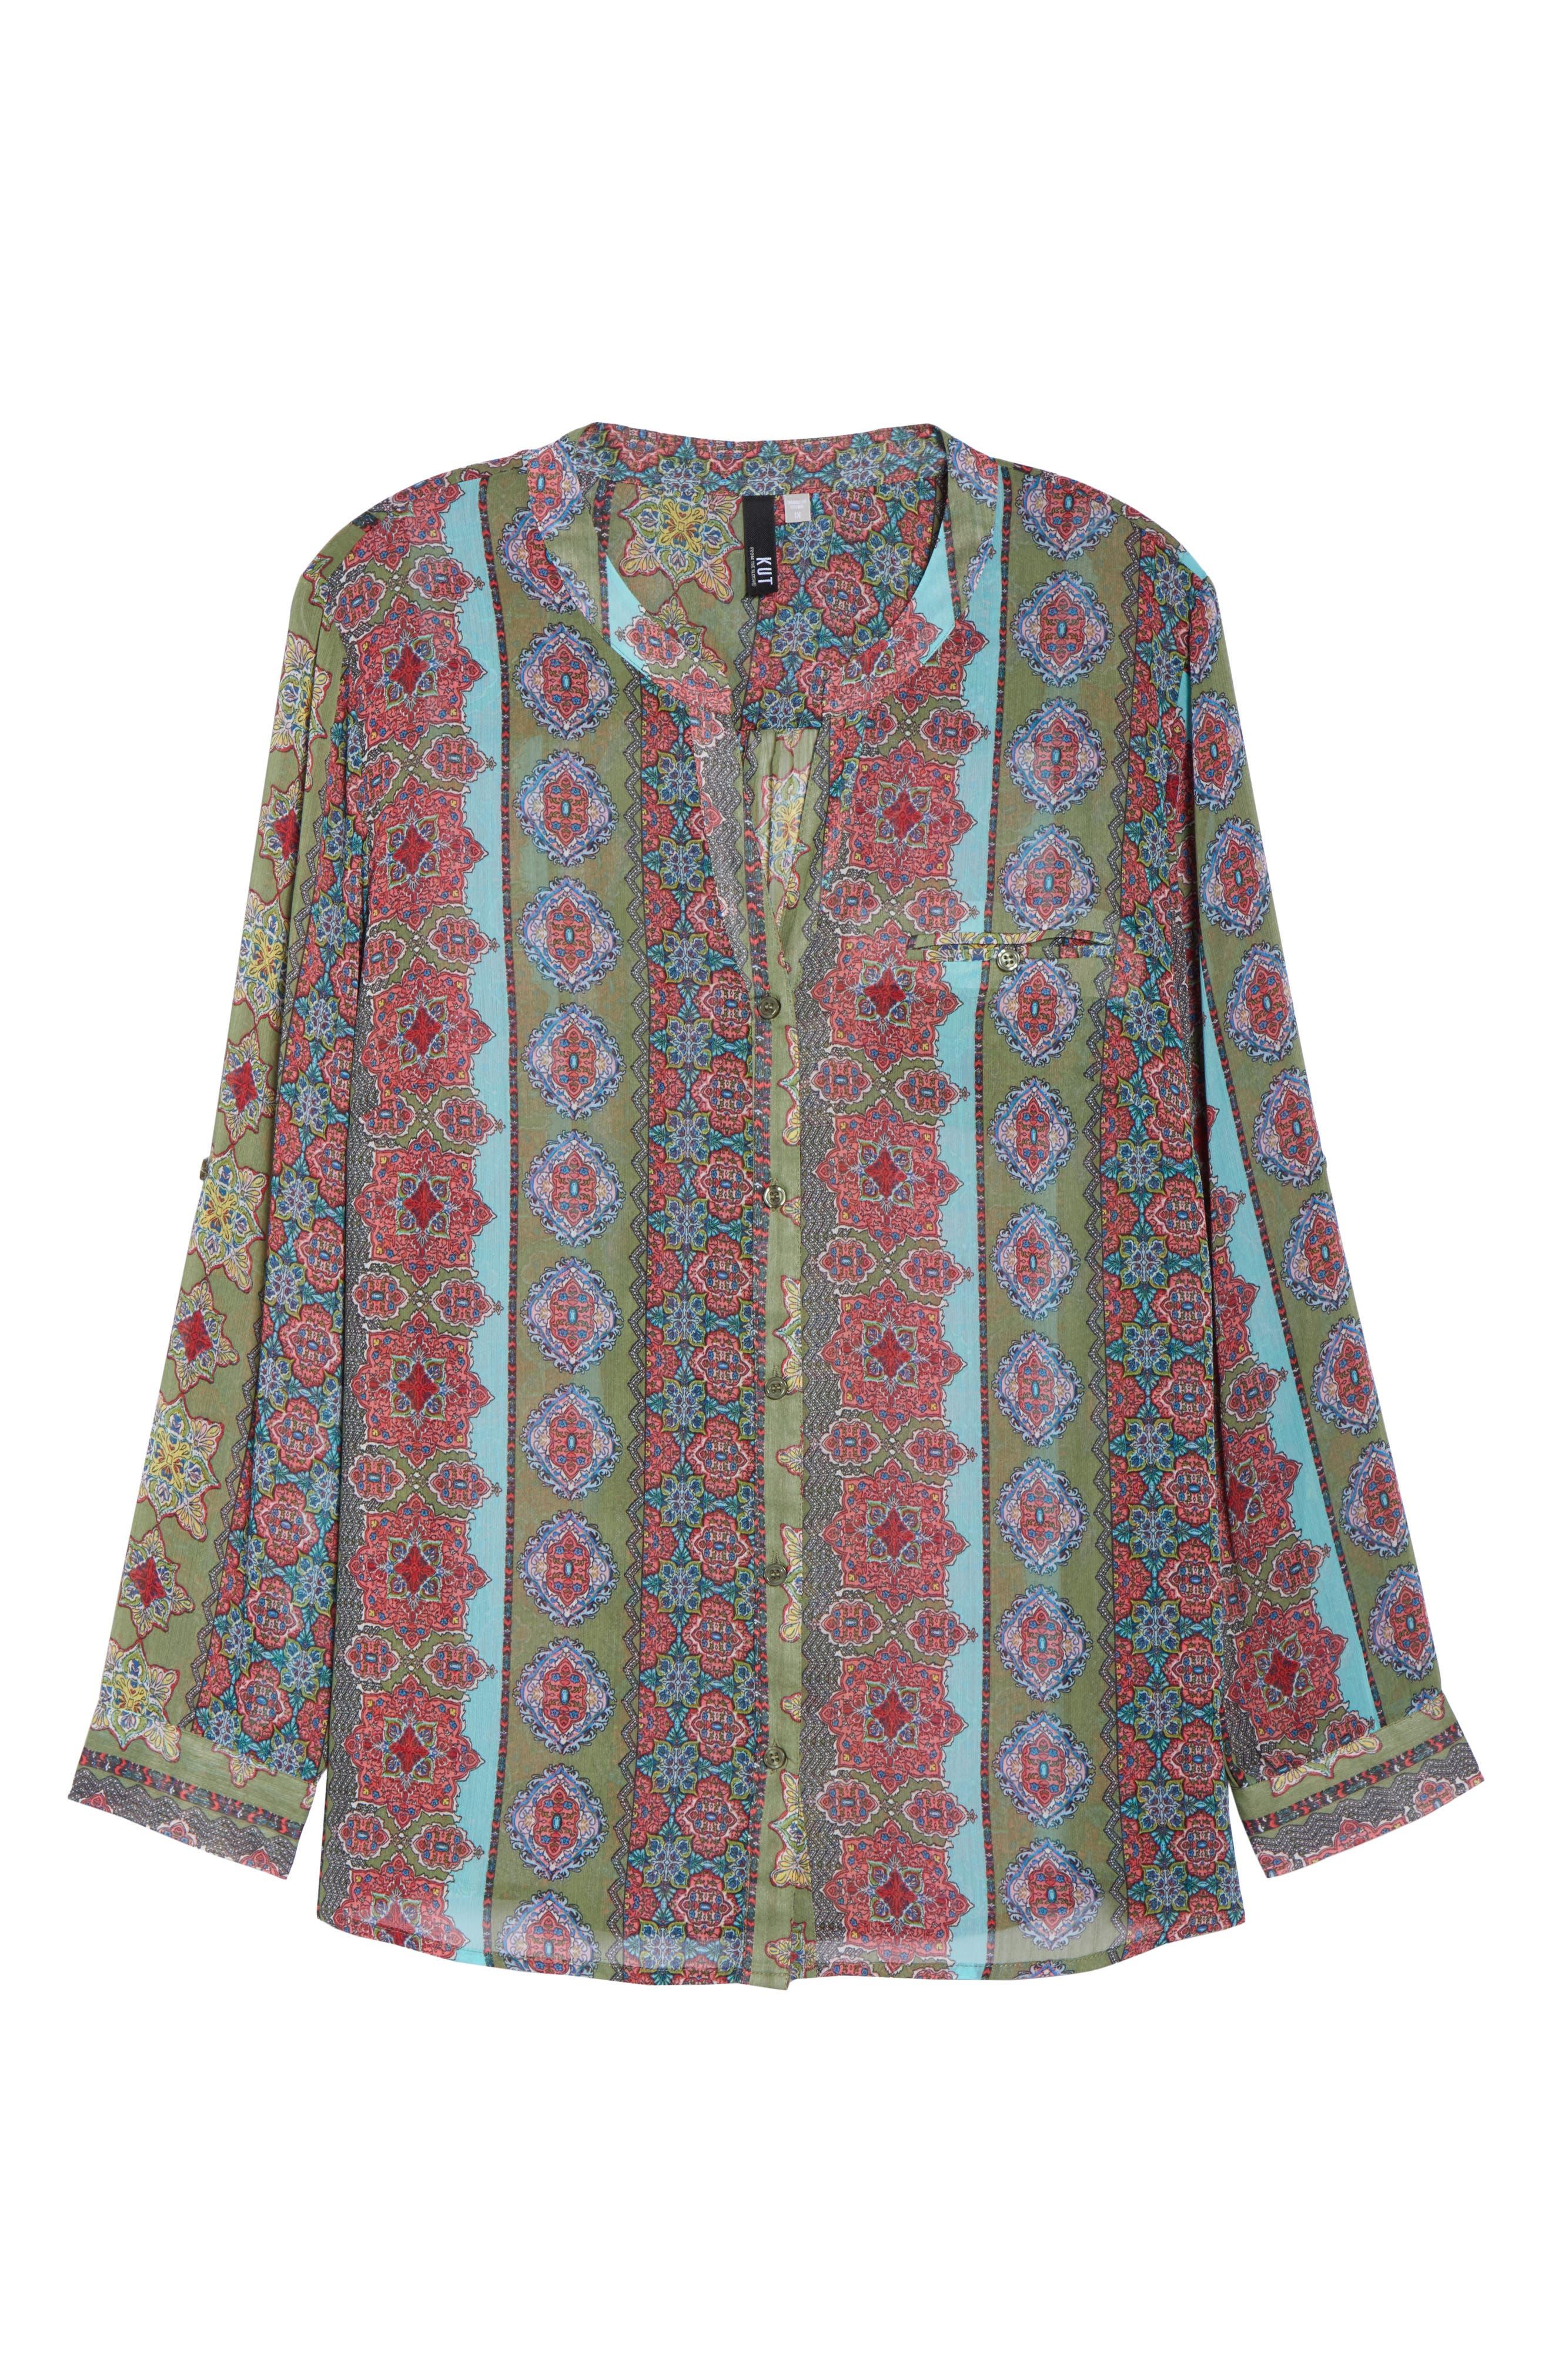 Jasmine Print Roll Sleeve Top,                             Alternate thumbnail 7, color,                             Olive/ Pink